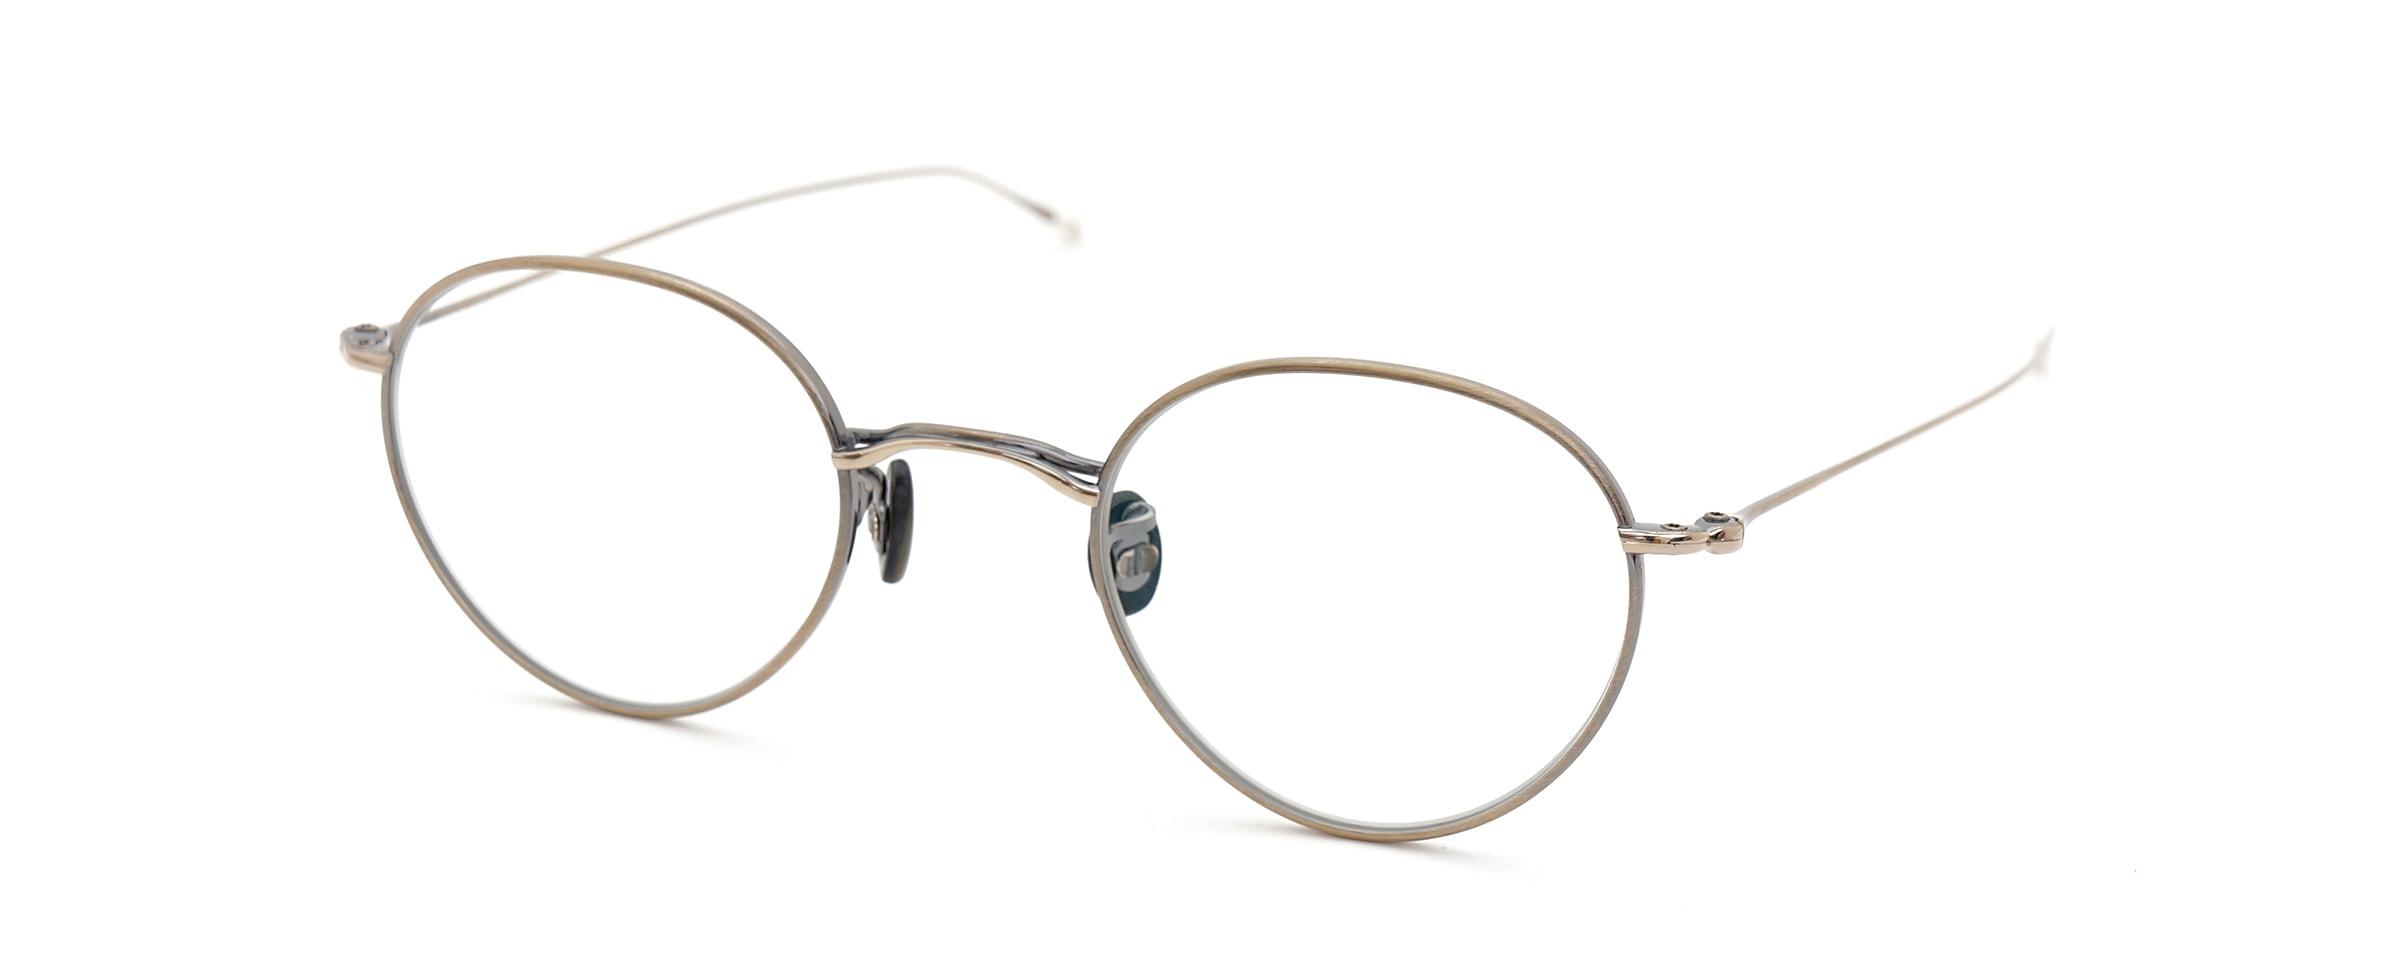 10 eyevan NO.3 45size 4S-CL OldGold全体像